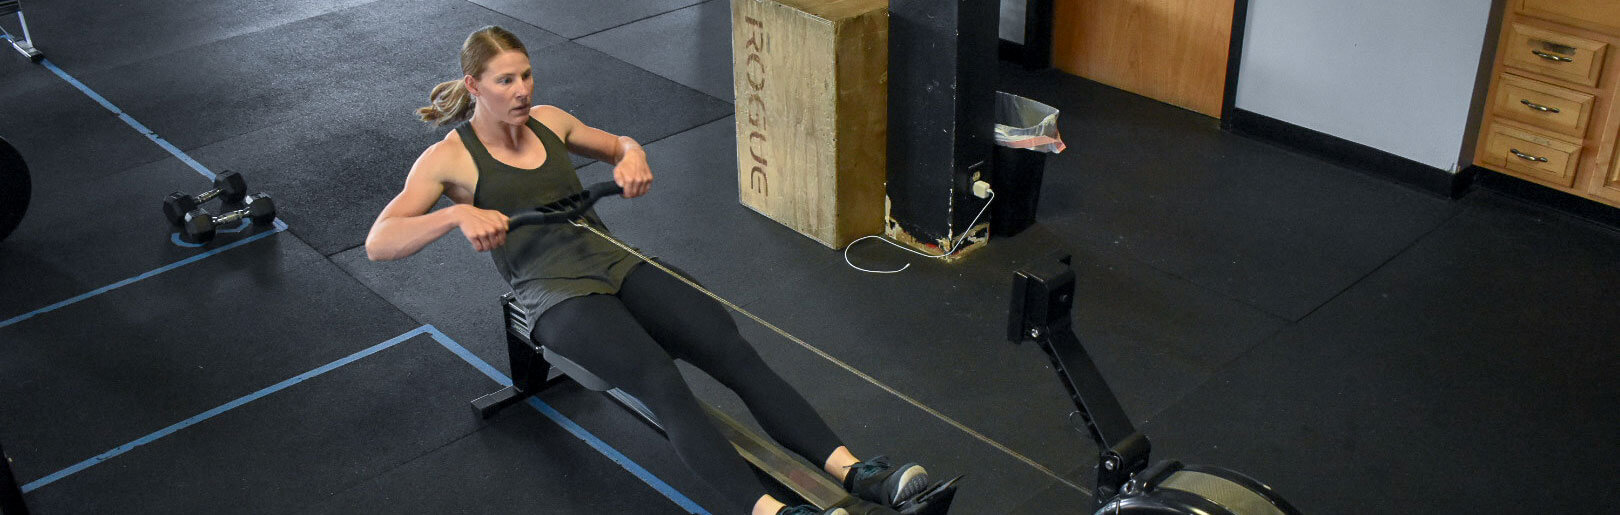 Female member rows on Concept 2 machine at CrossFit Alaska.